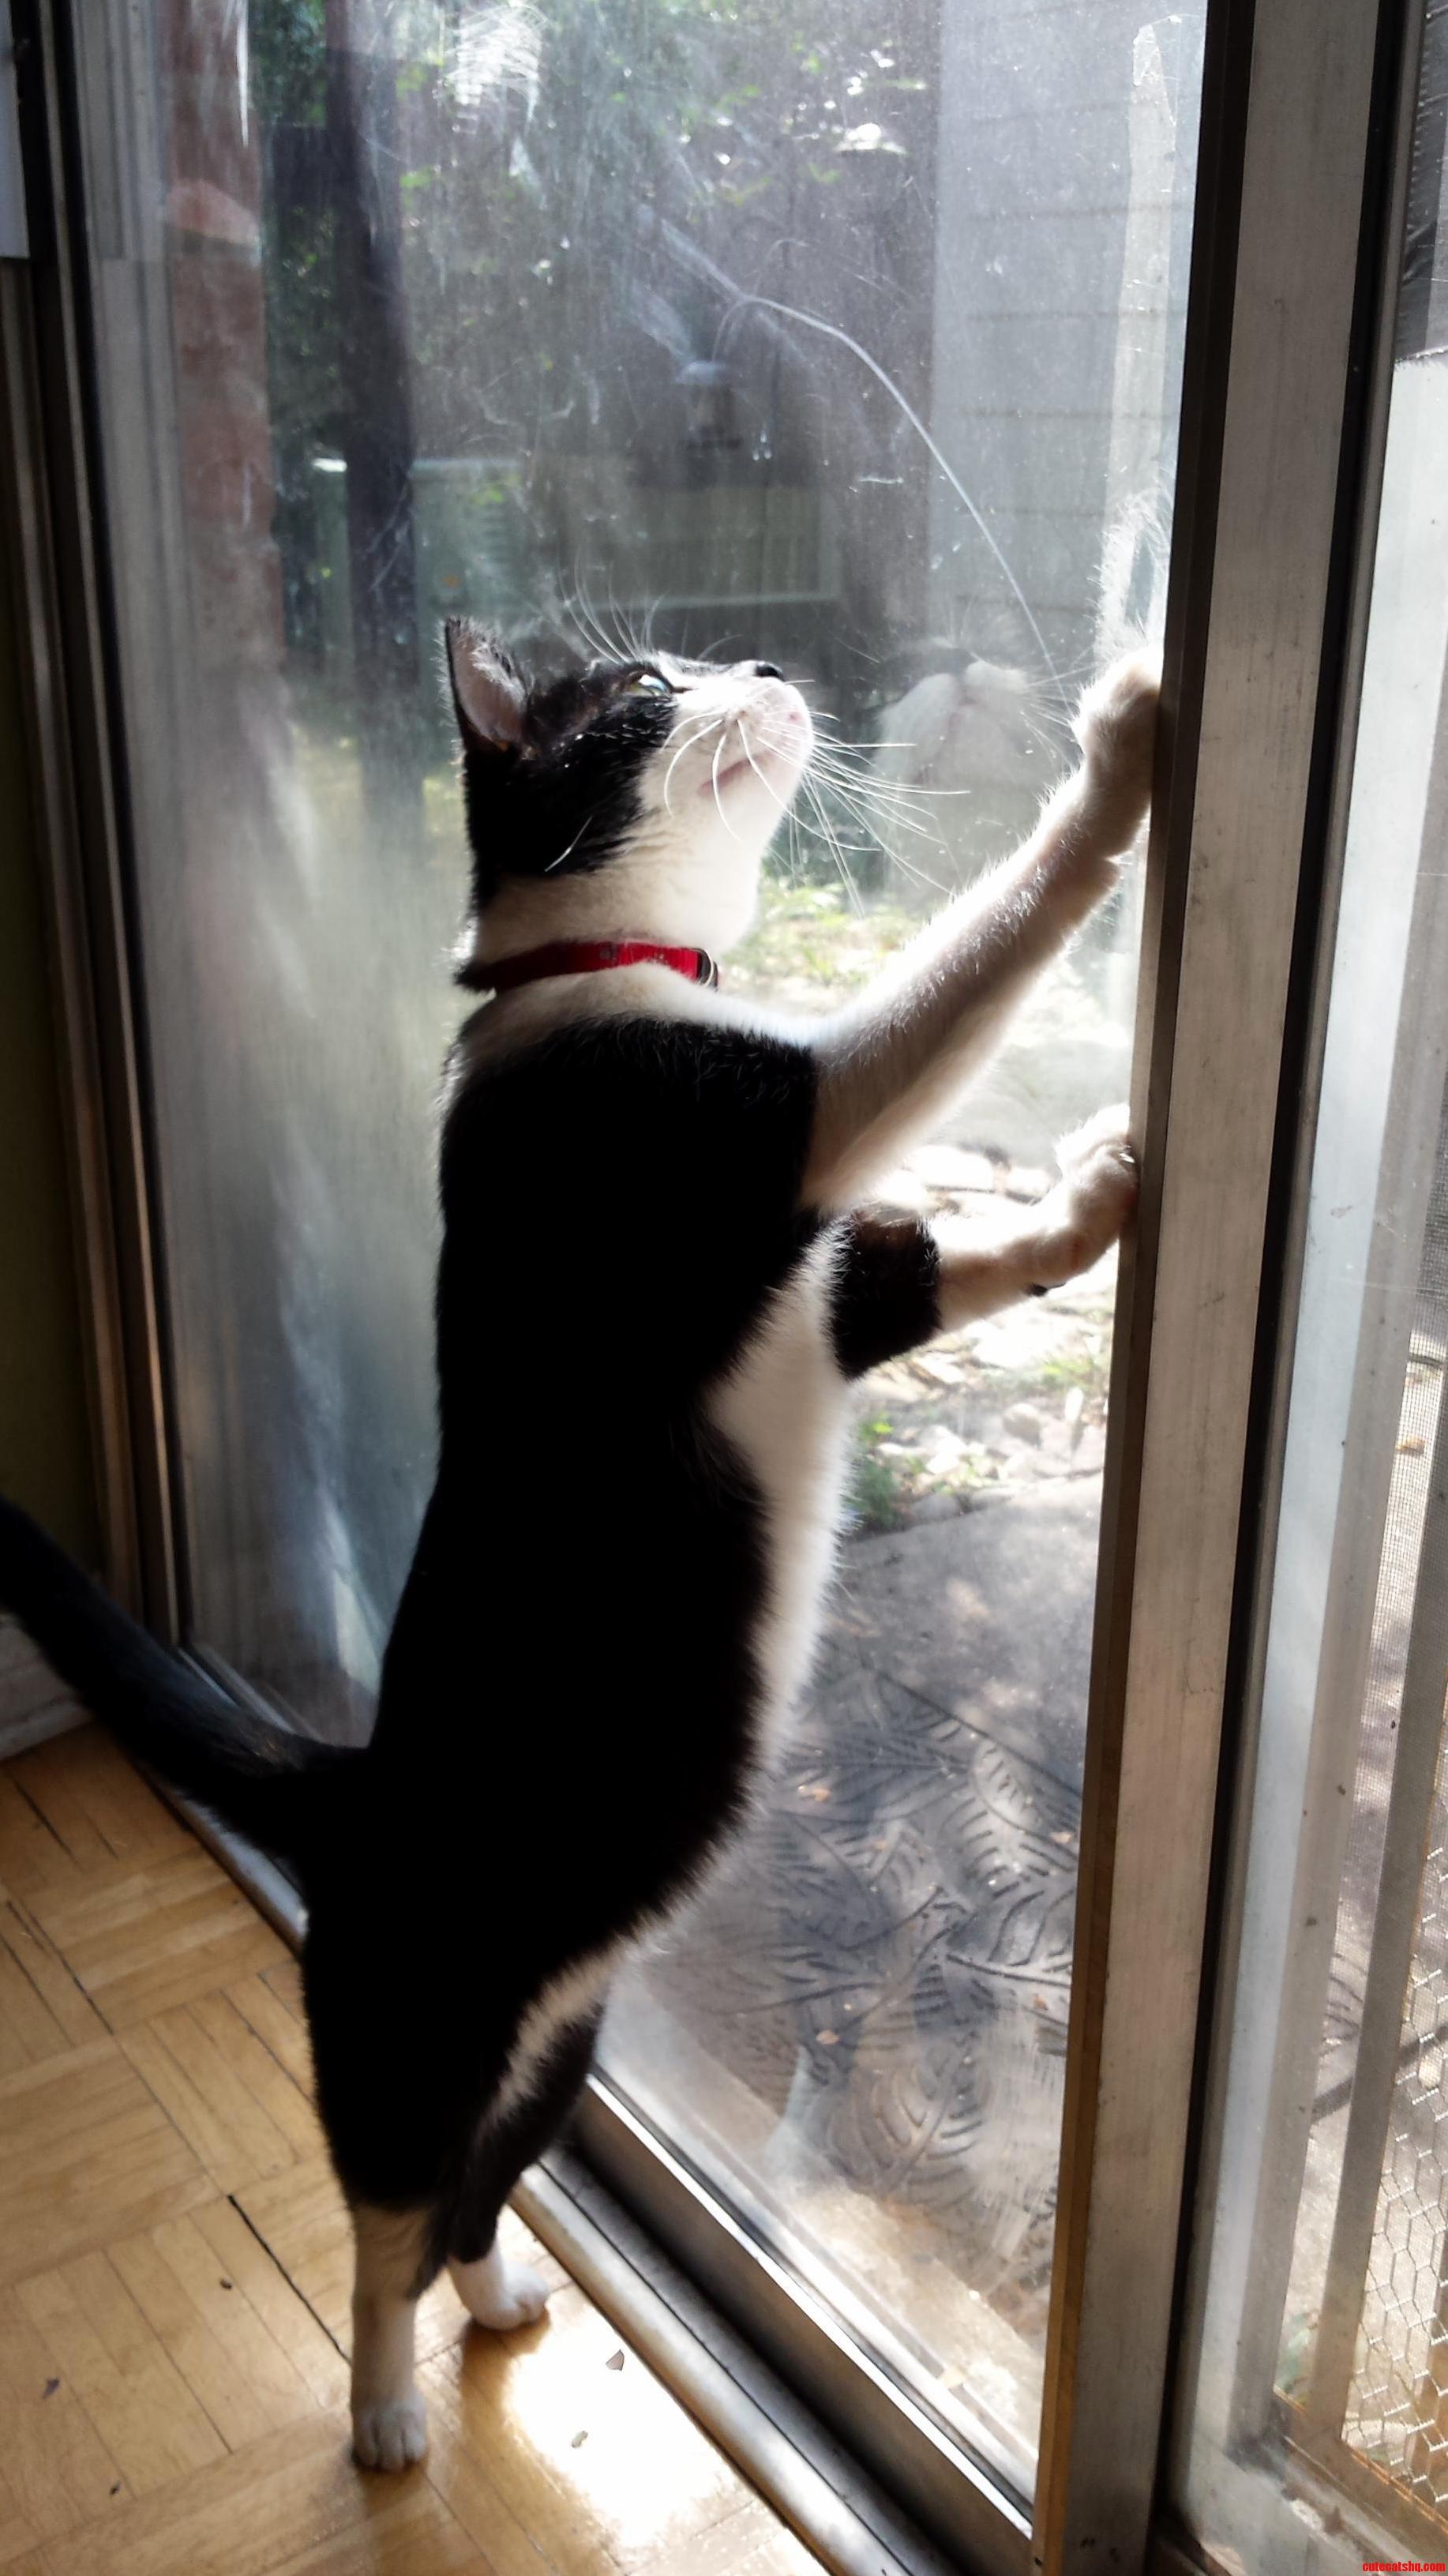 Milo sees a lizard